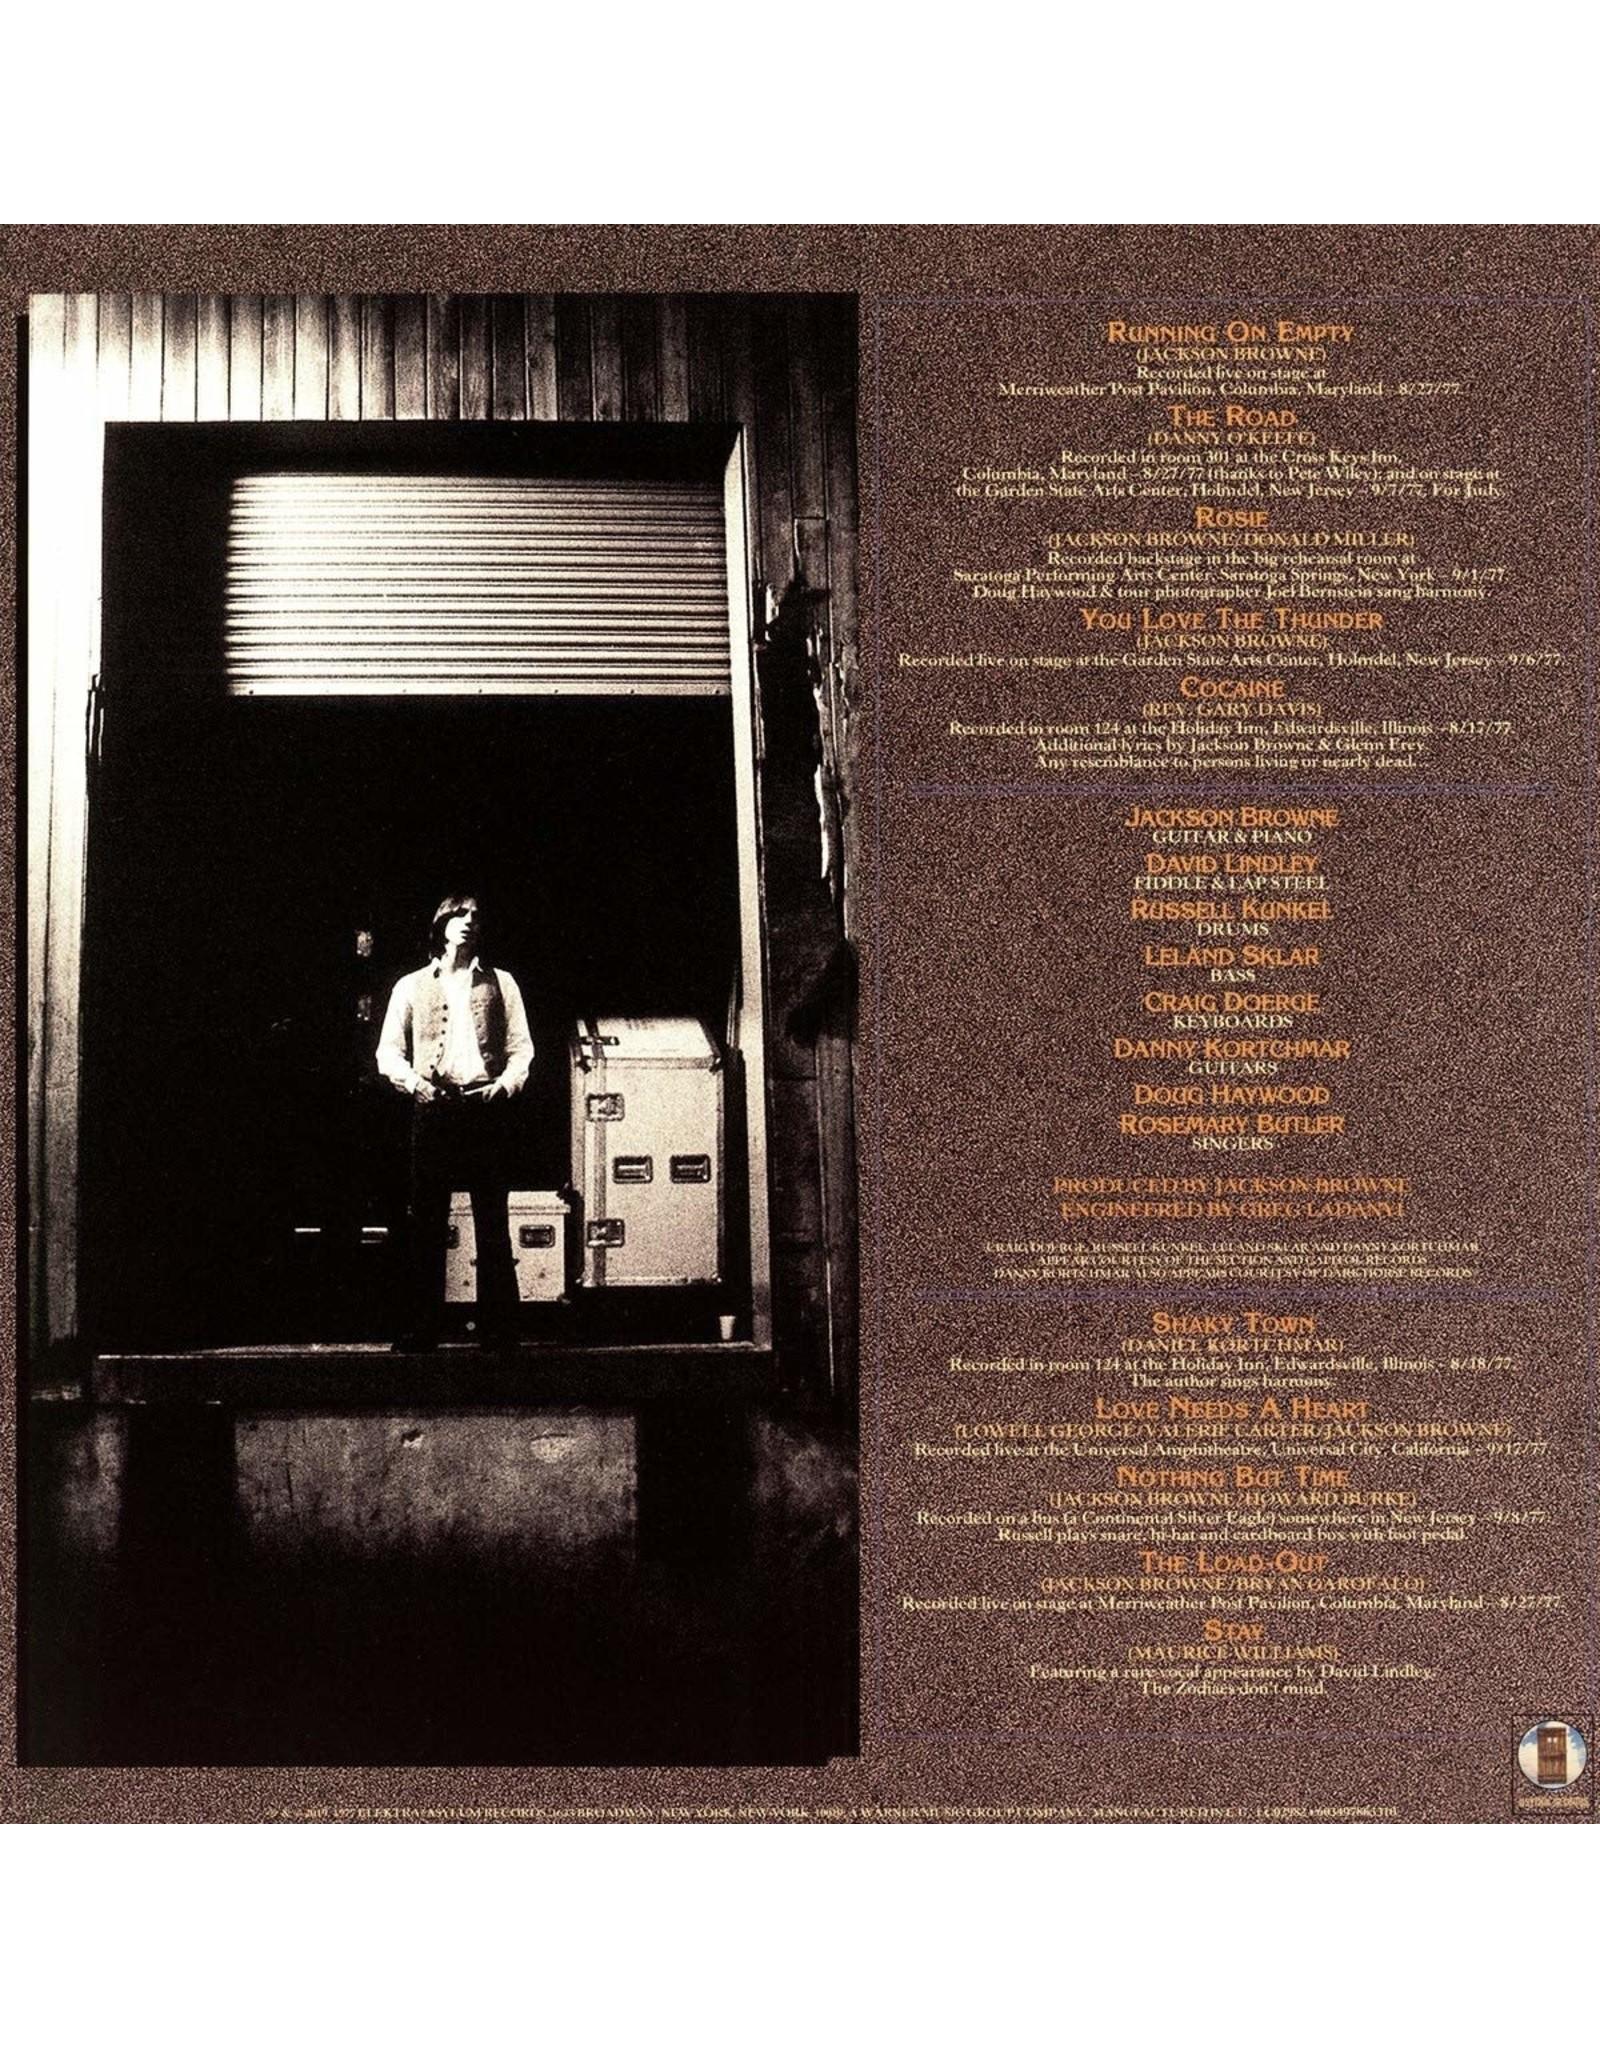 Jackson Browne - Running On Empty